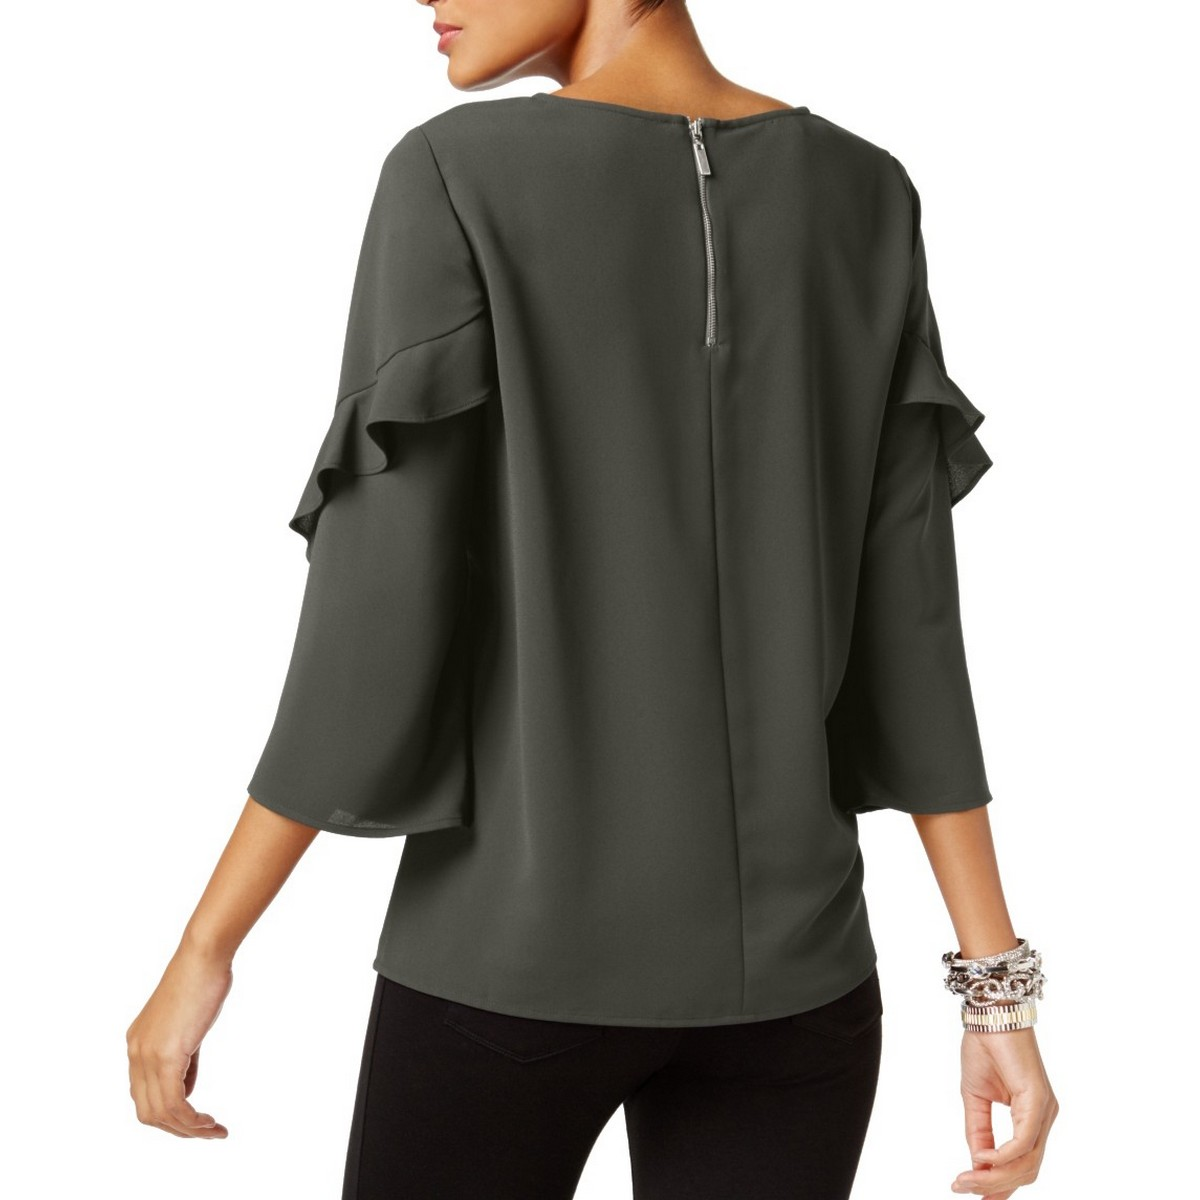 ALFANI-NEW-Women-039-s-3-4-Ruffled-sleeve-Zip-back-Blouse-Shirt-Top-TEDO thumbnail 13